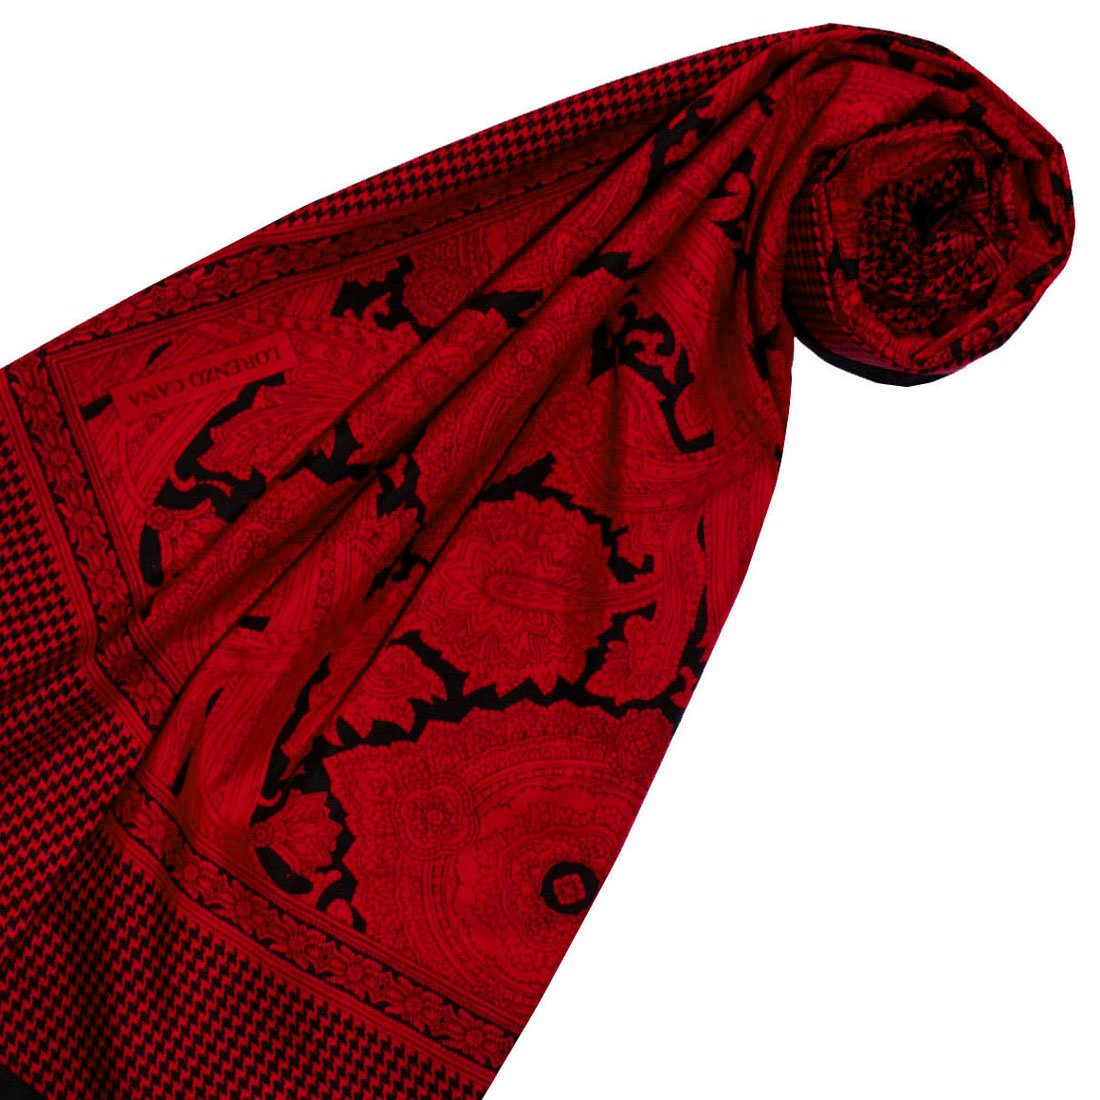 LORENZO CANA High End Scarf Pashmina Shawl 65/% Cotton 35/% Silk Printed Paisley Pattern Harmonious Colors 43 x 43